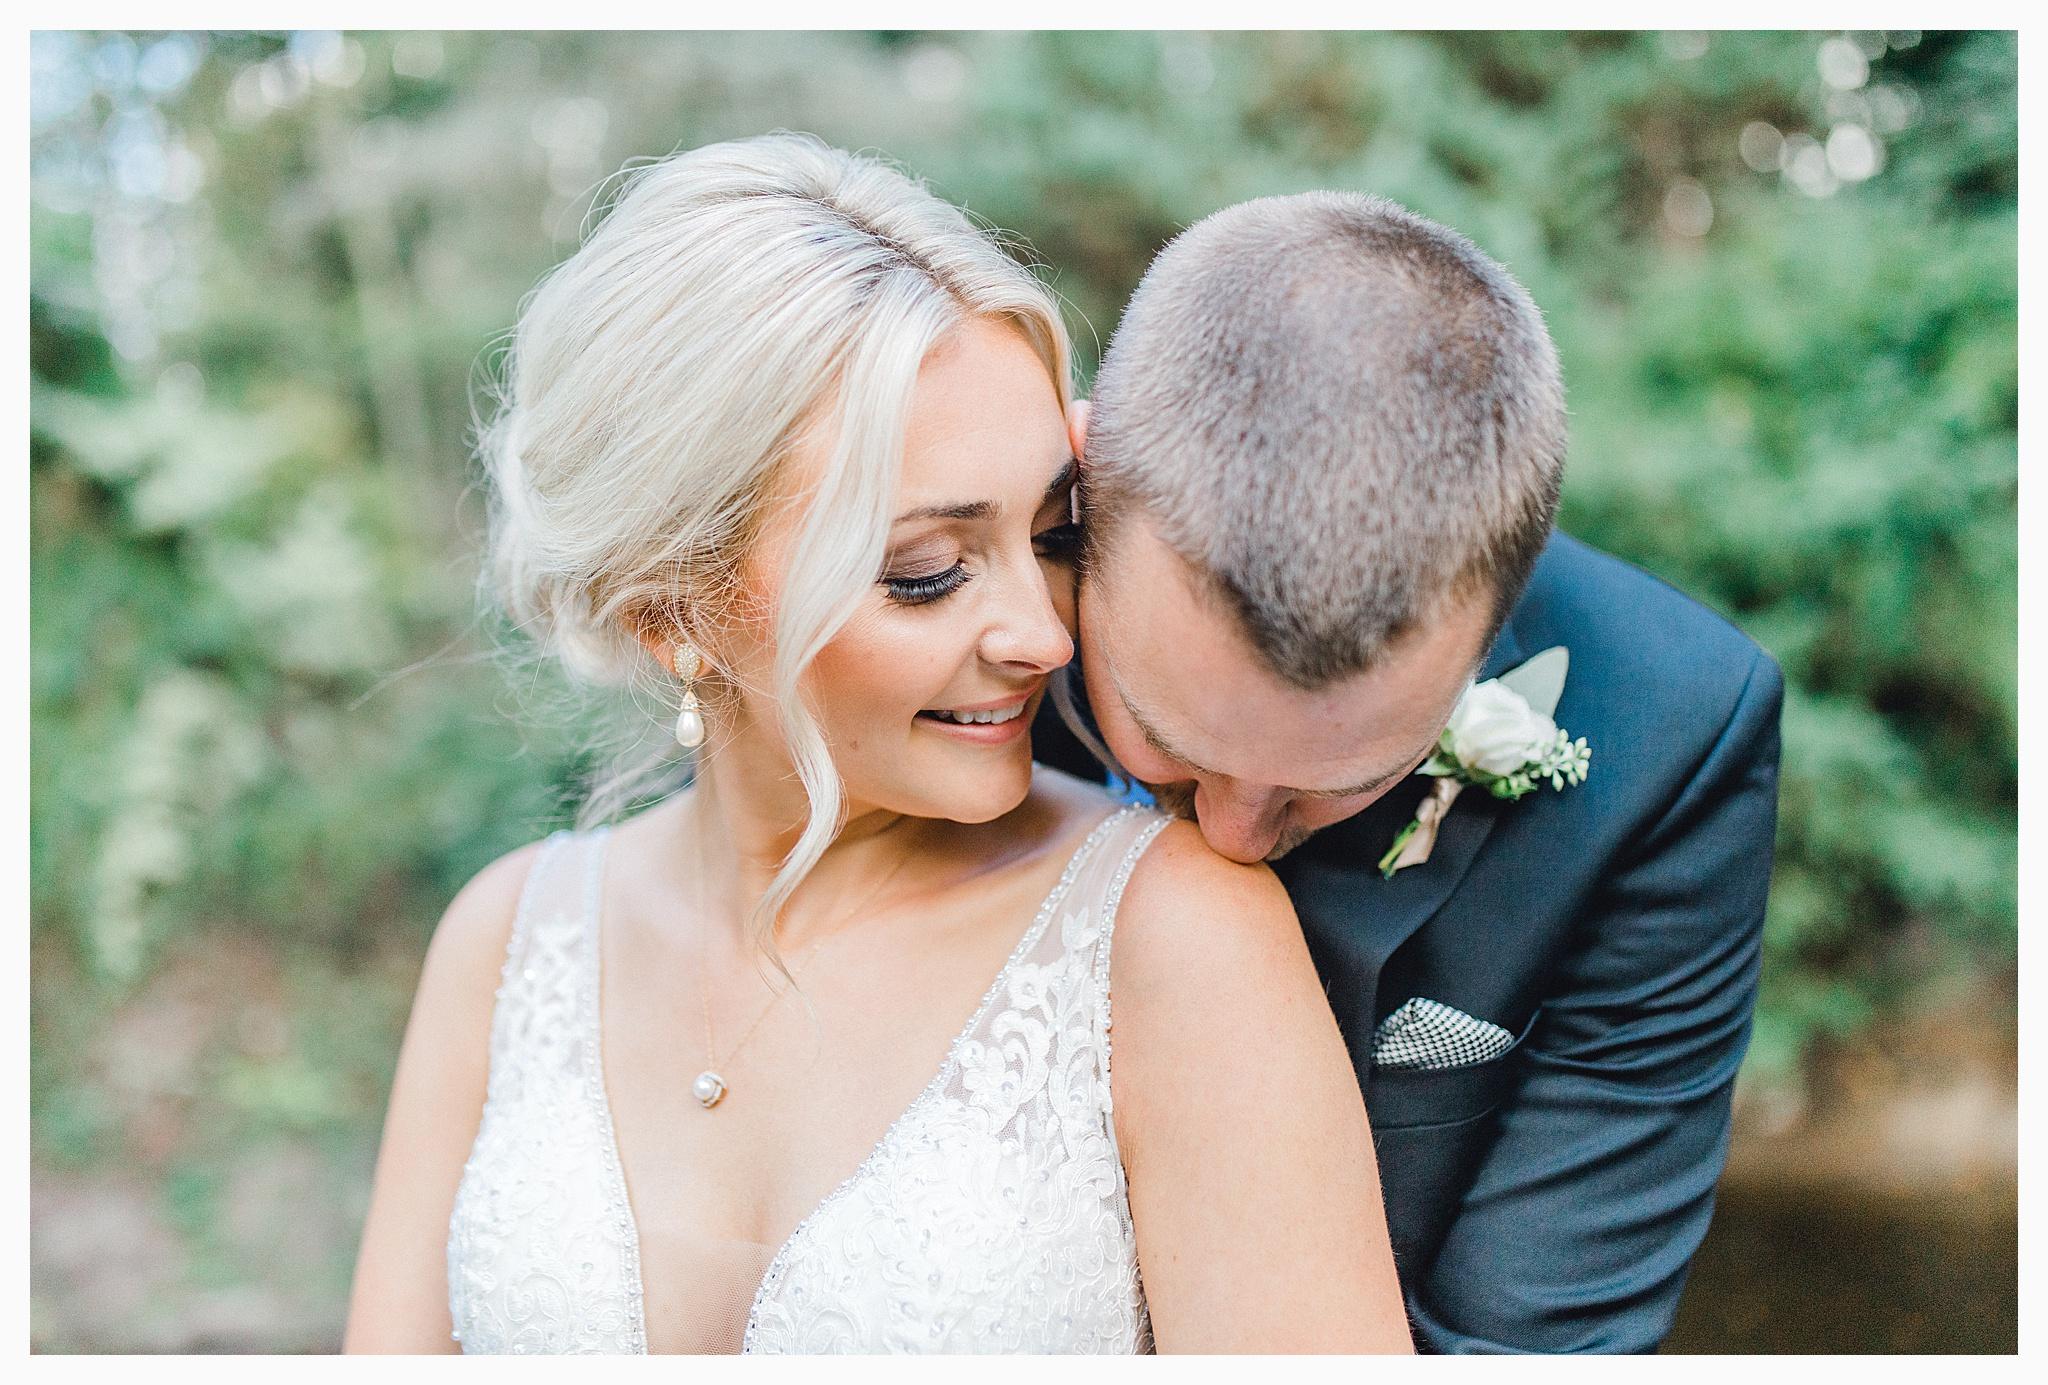 Emma Rose Company Light and Airy Wedding Photographer, Beautiful fall wedding at Rock Creek Gardens Venue in Puyallup, Washington._0033.jpg